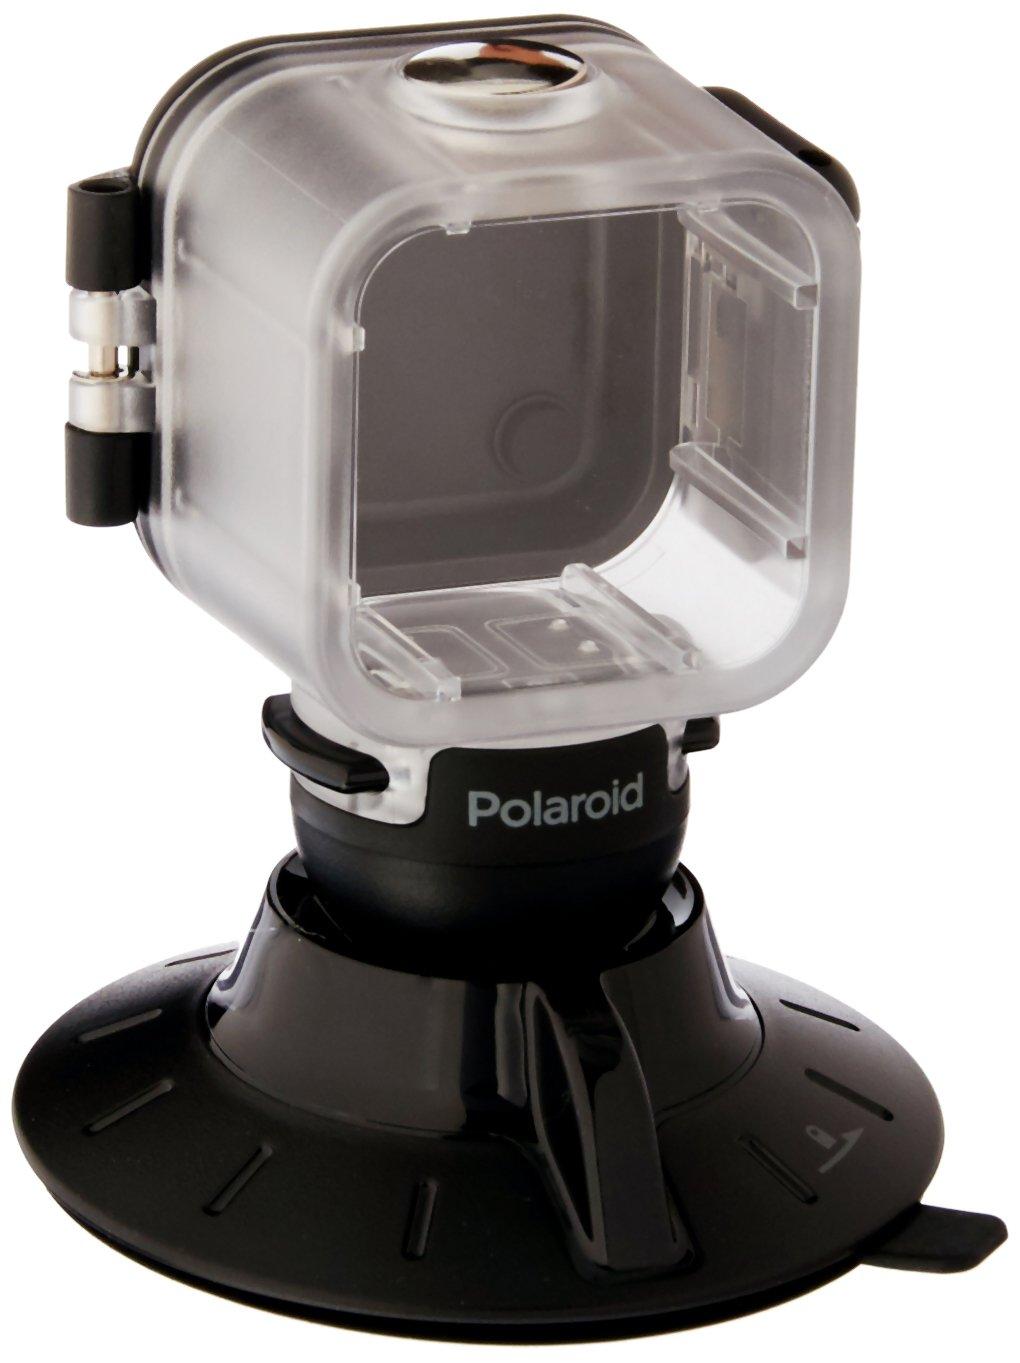 Polaroid Cube/キューブデジタルビデオアクションカメラ専用 Polaroid 吸盤マウントカップ 防水性カメラケース付属 B00O7TH7JW, 柳井のごまとうふ:115359e8 --- integralved.hu